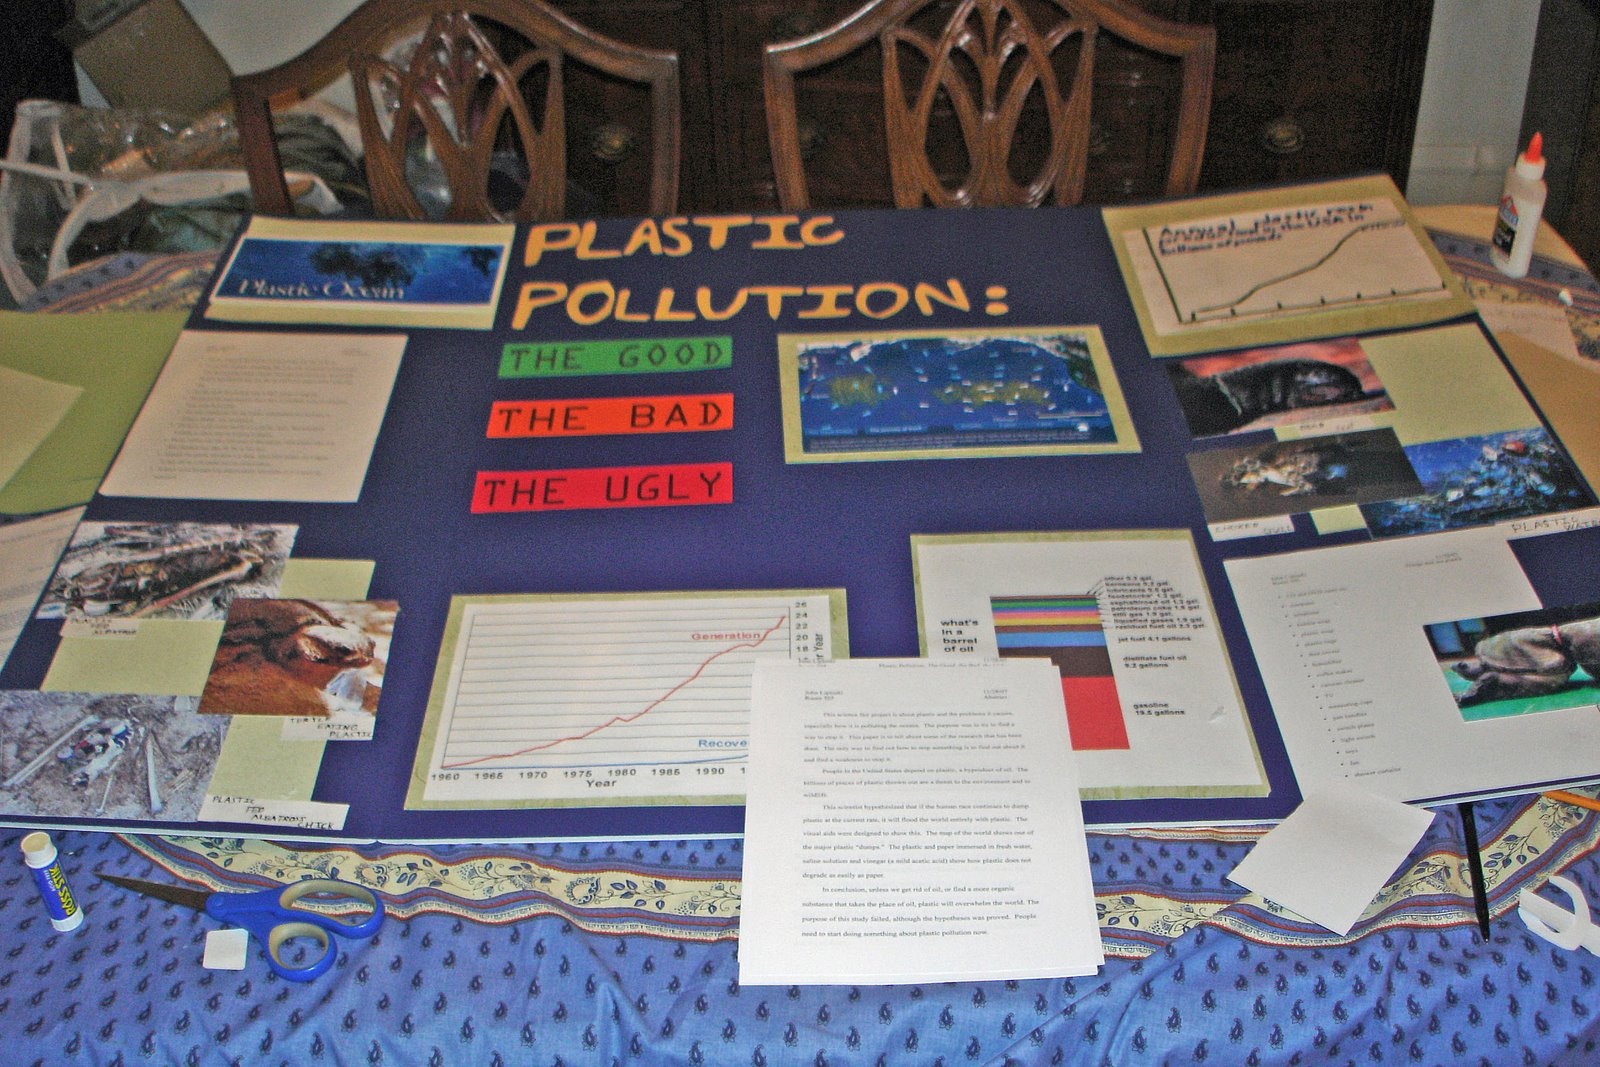 Gyres science fair project